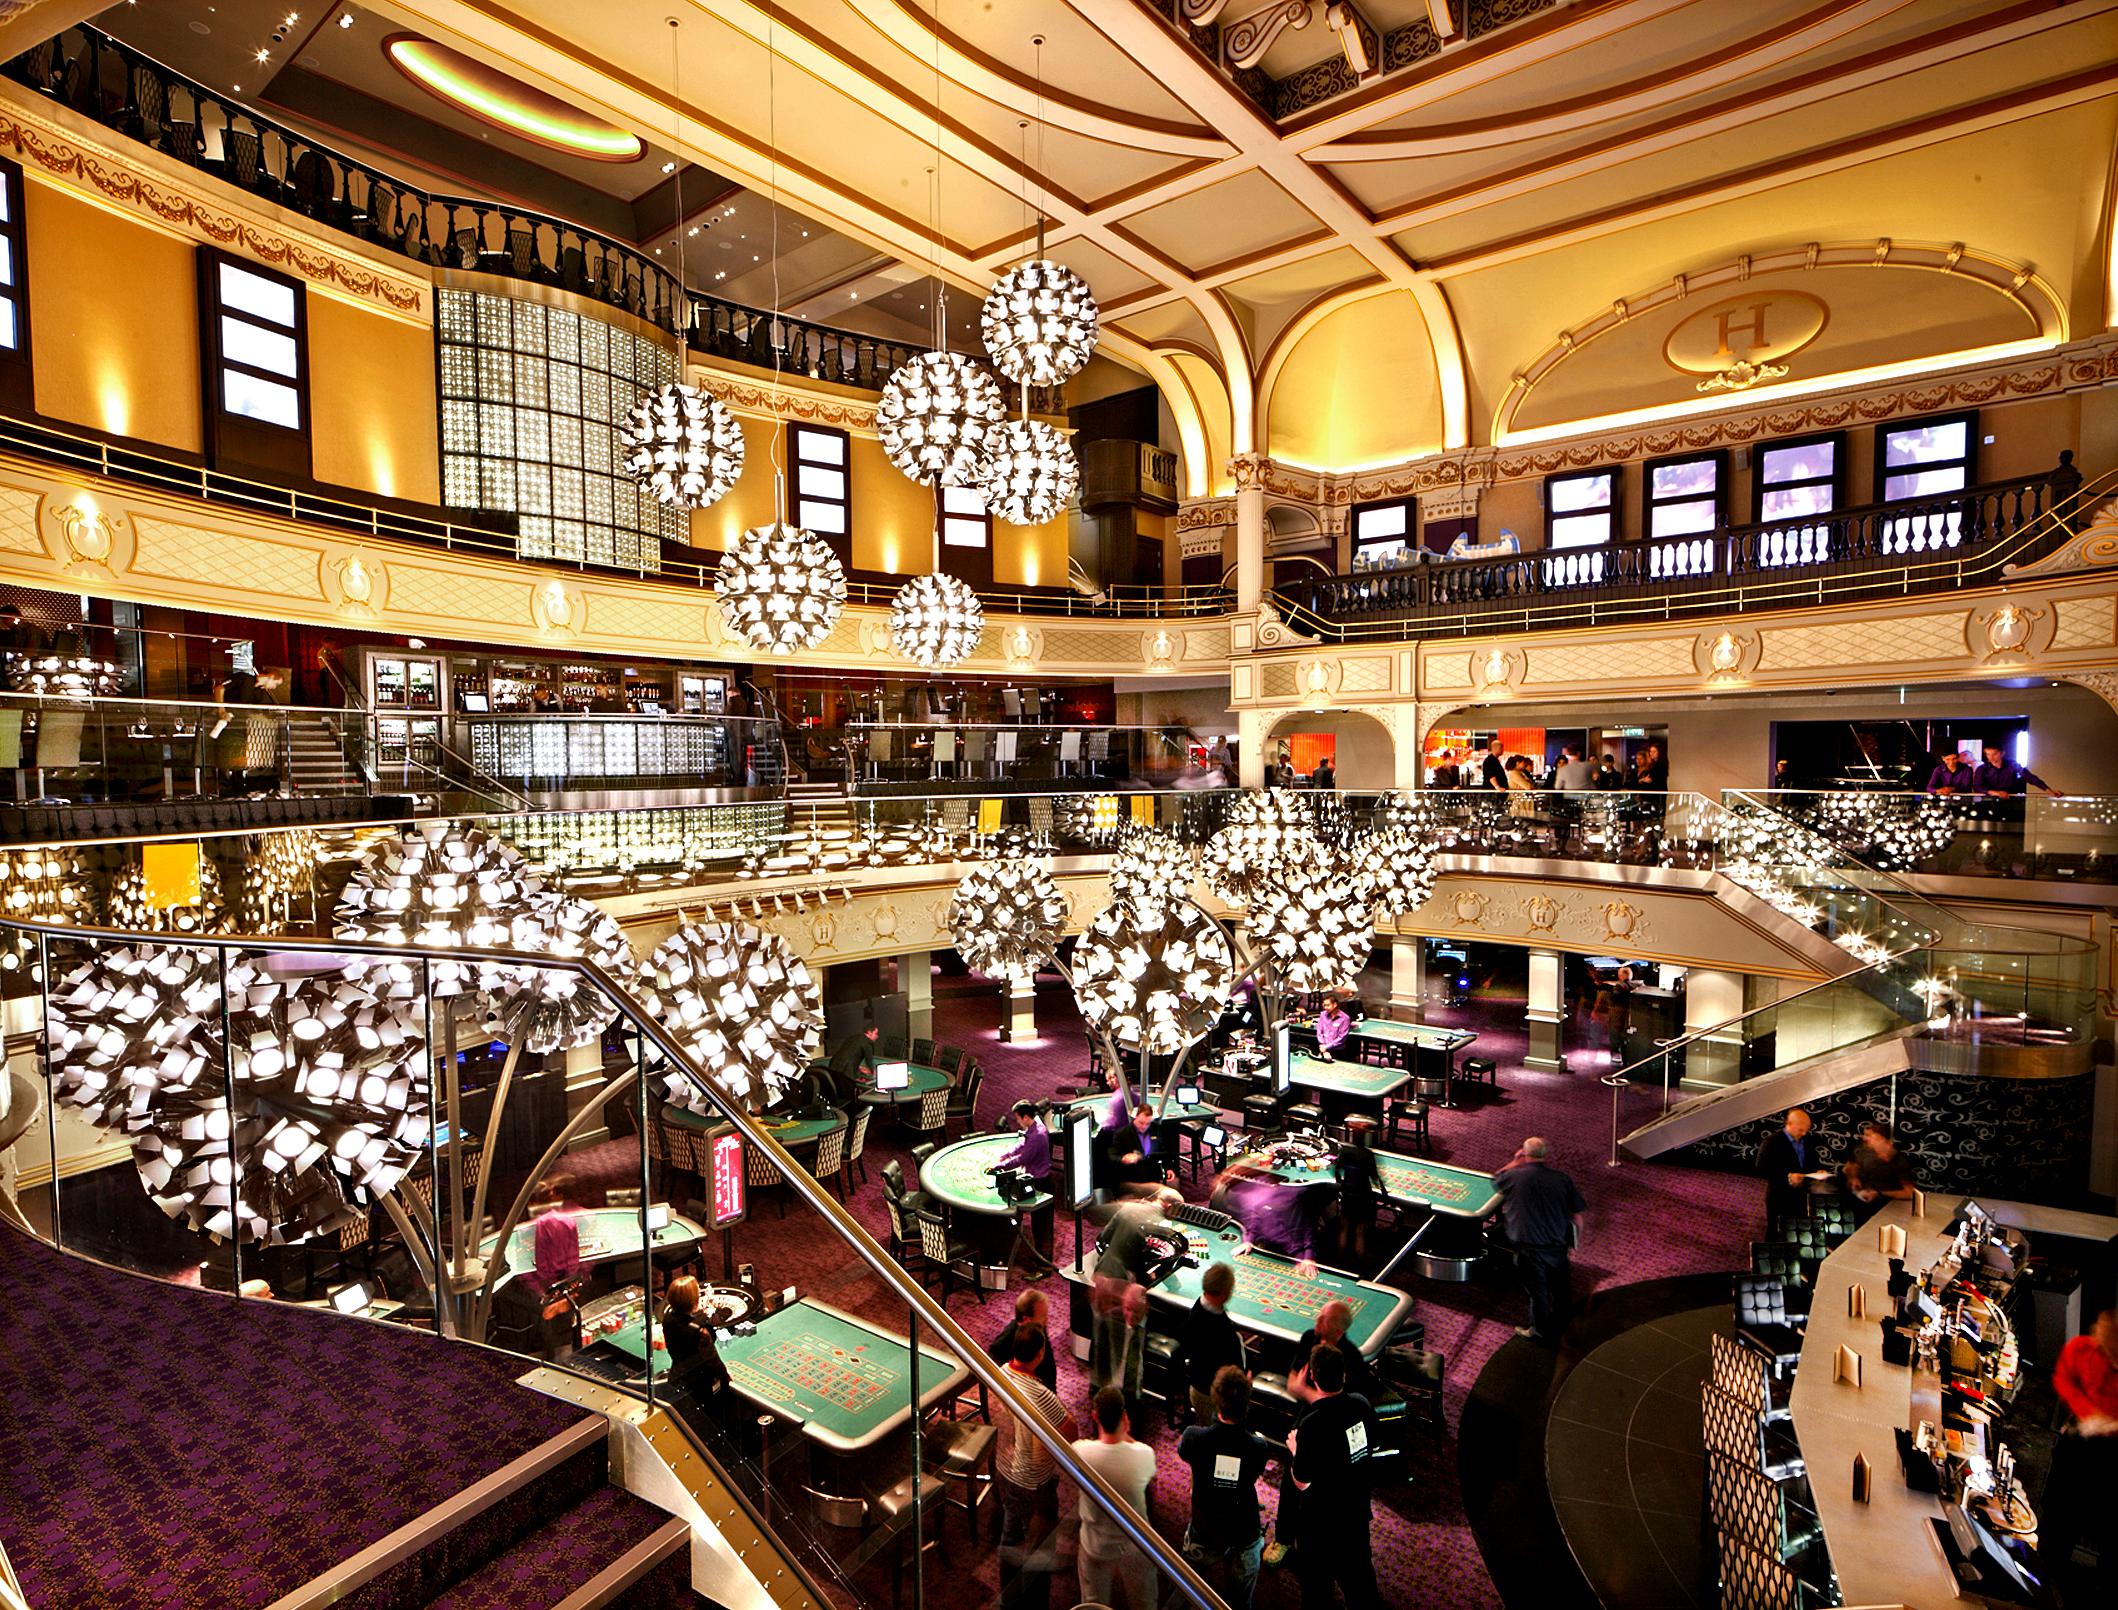 Grosvenor casino yarmouth dress code